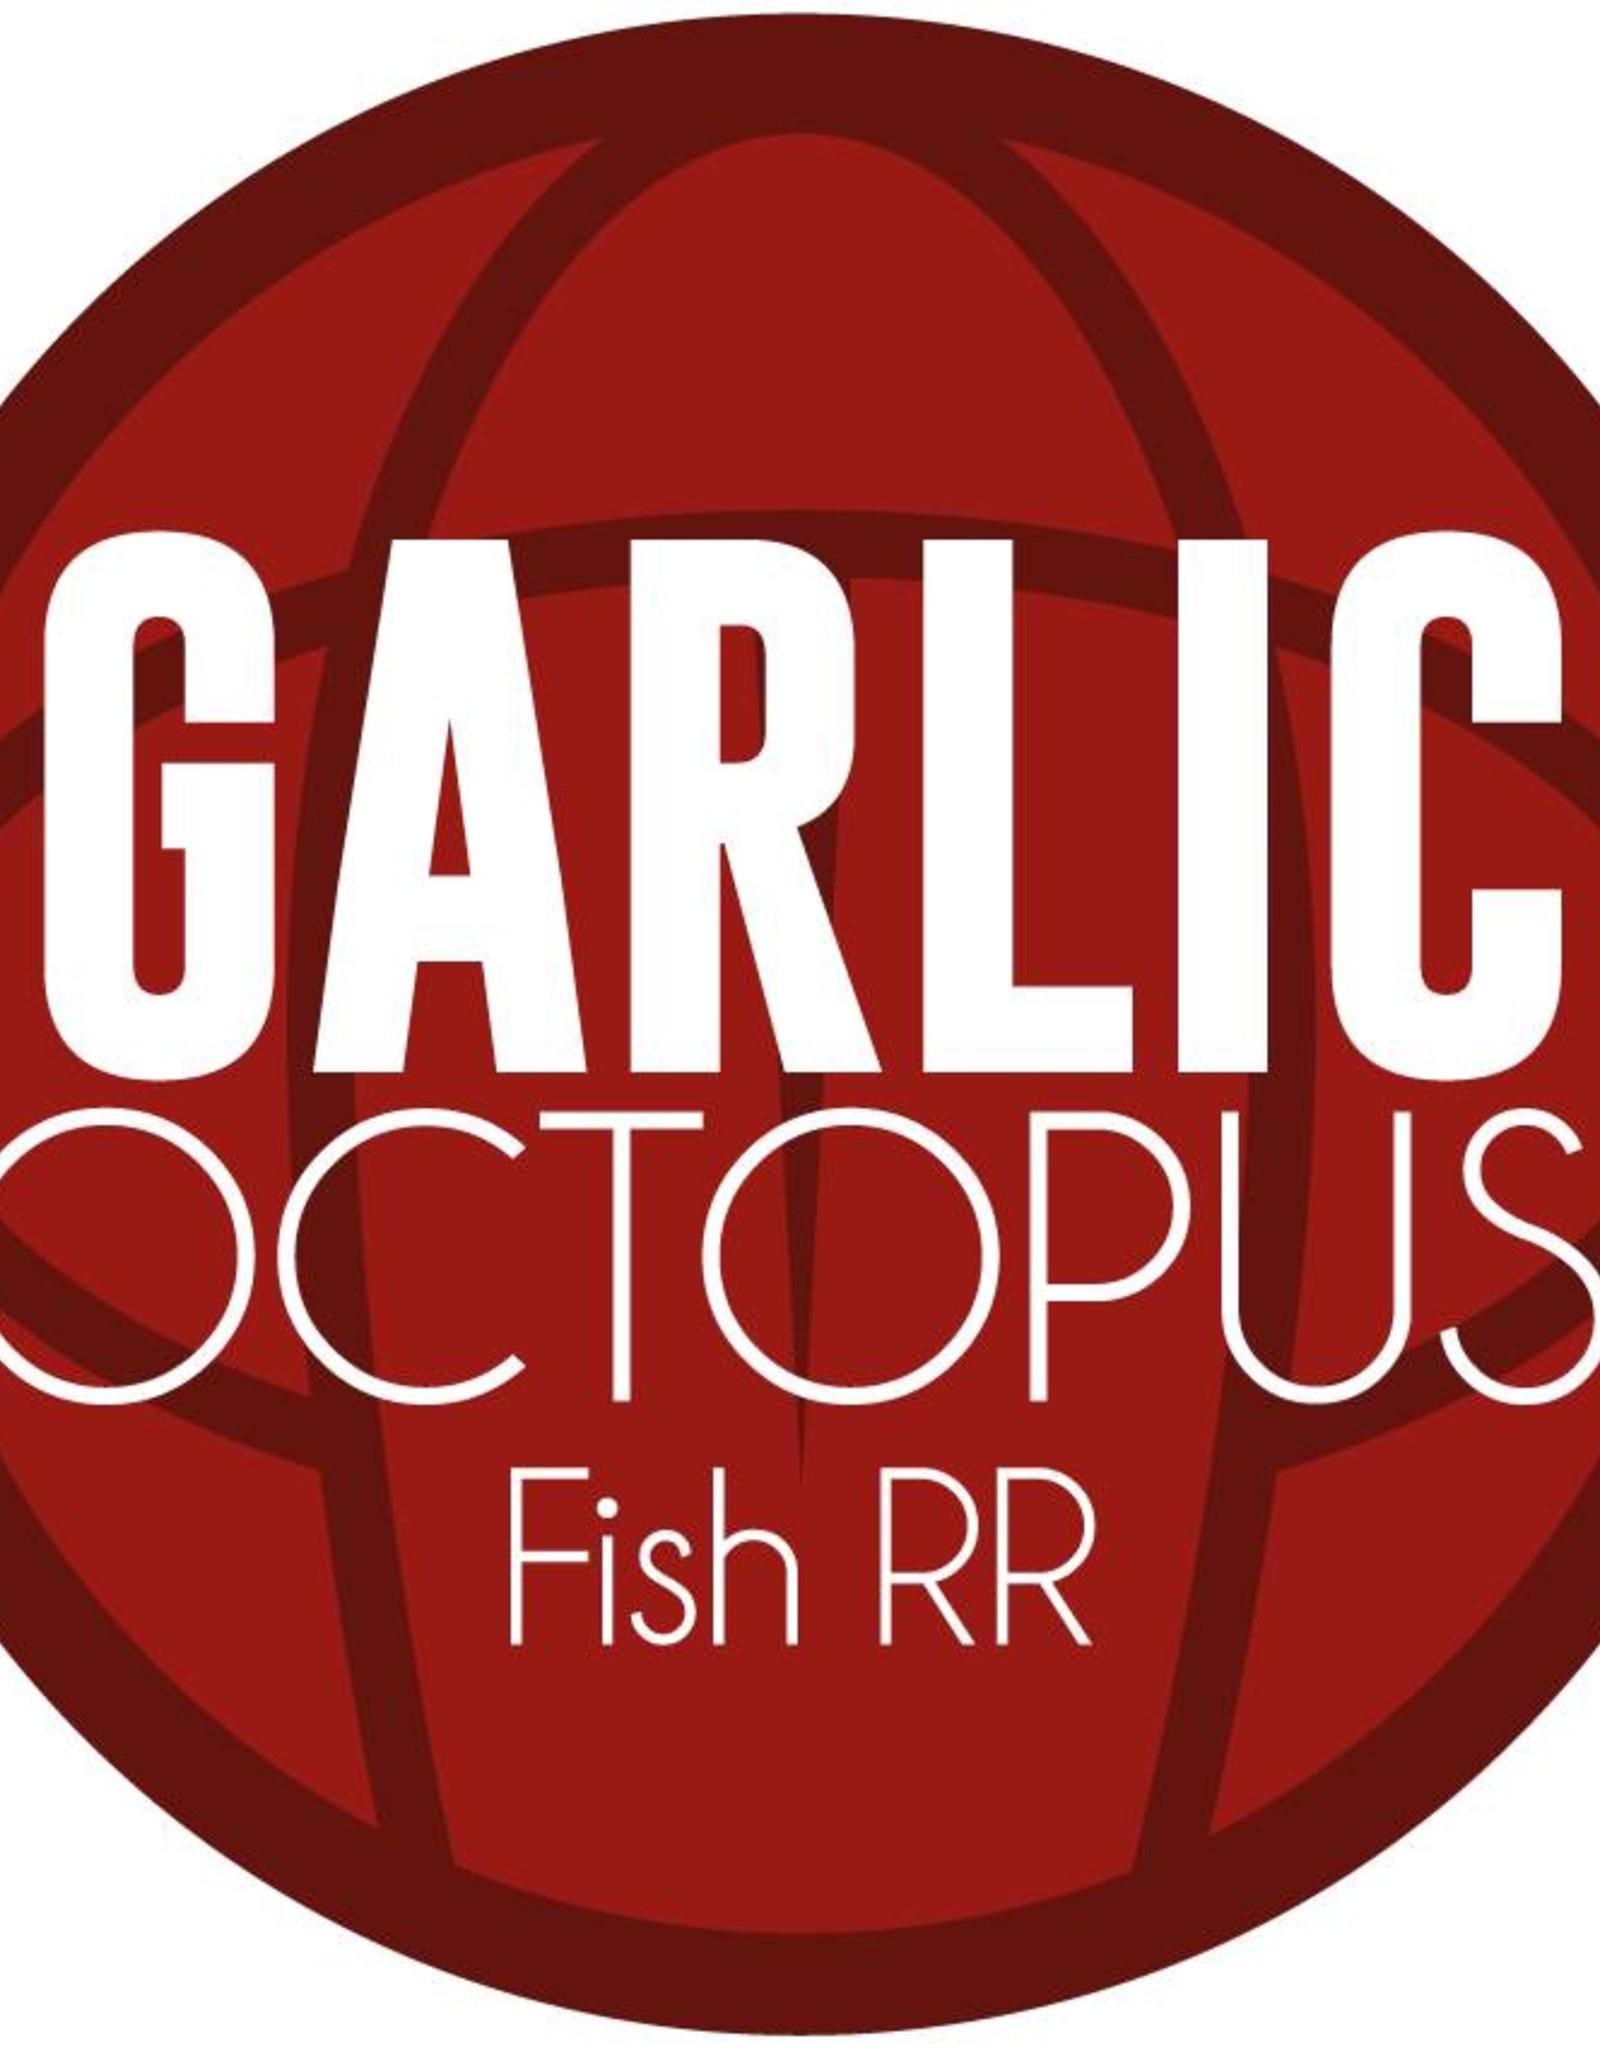 Baitworld Baitworld Garlic Octopus Fish RR Pakket Deal 2